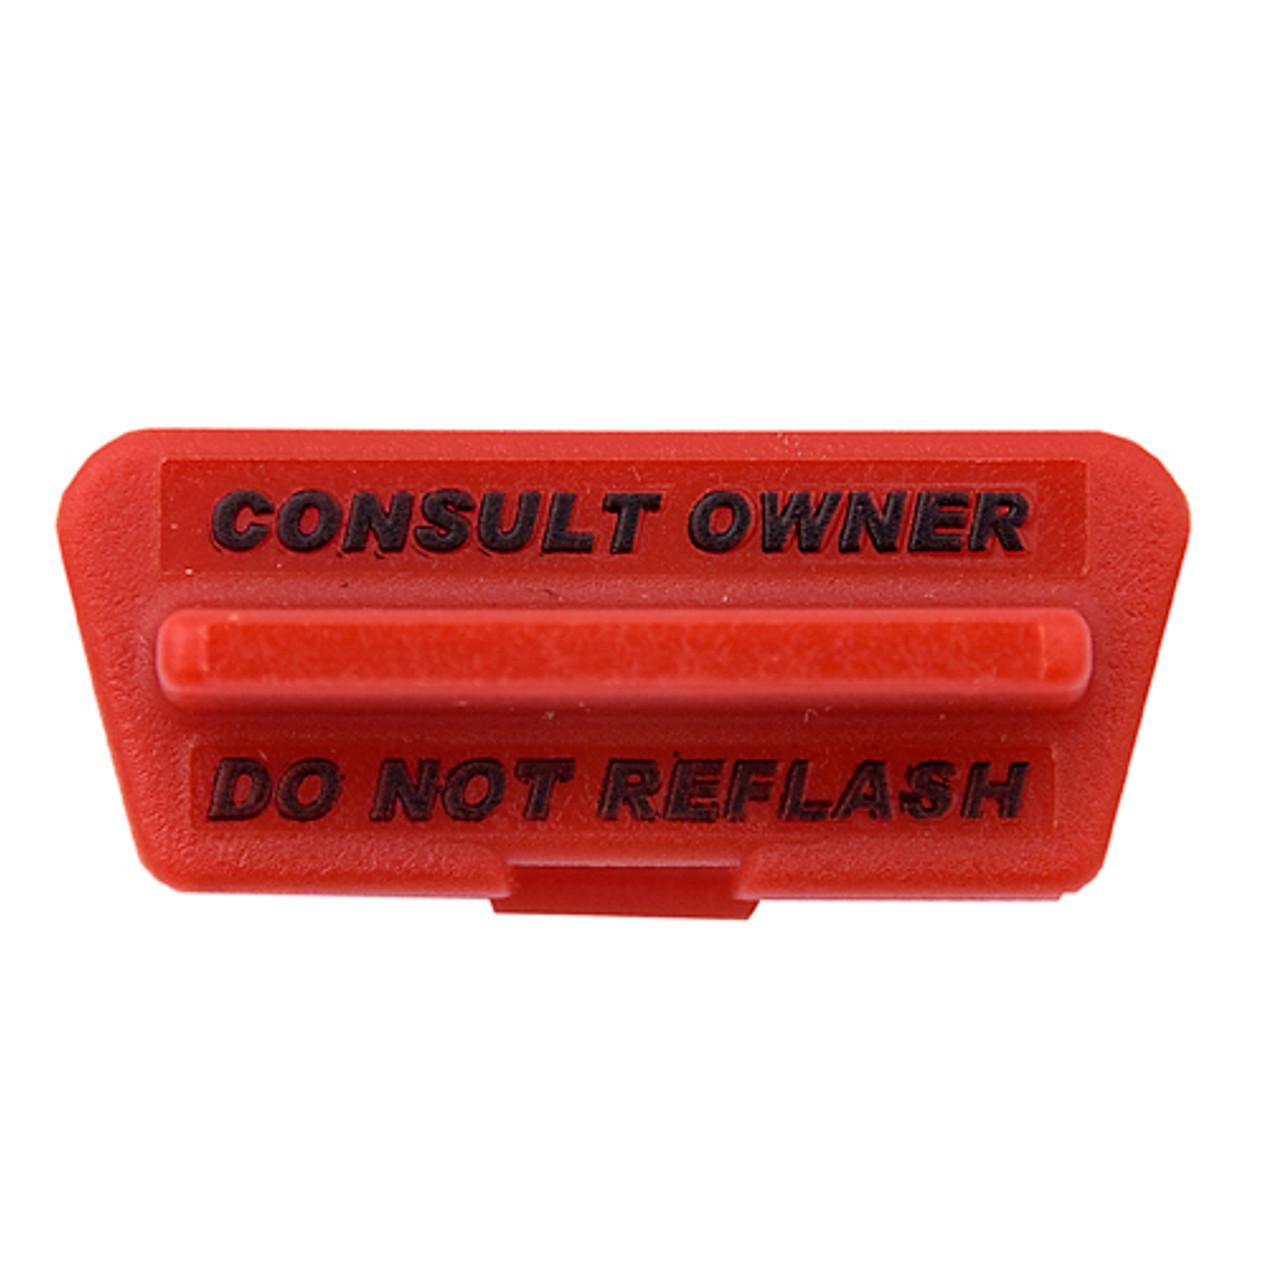 OBD2 OBDII Port Cover Do Not Reflash